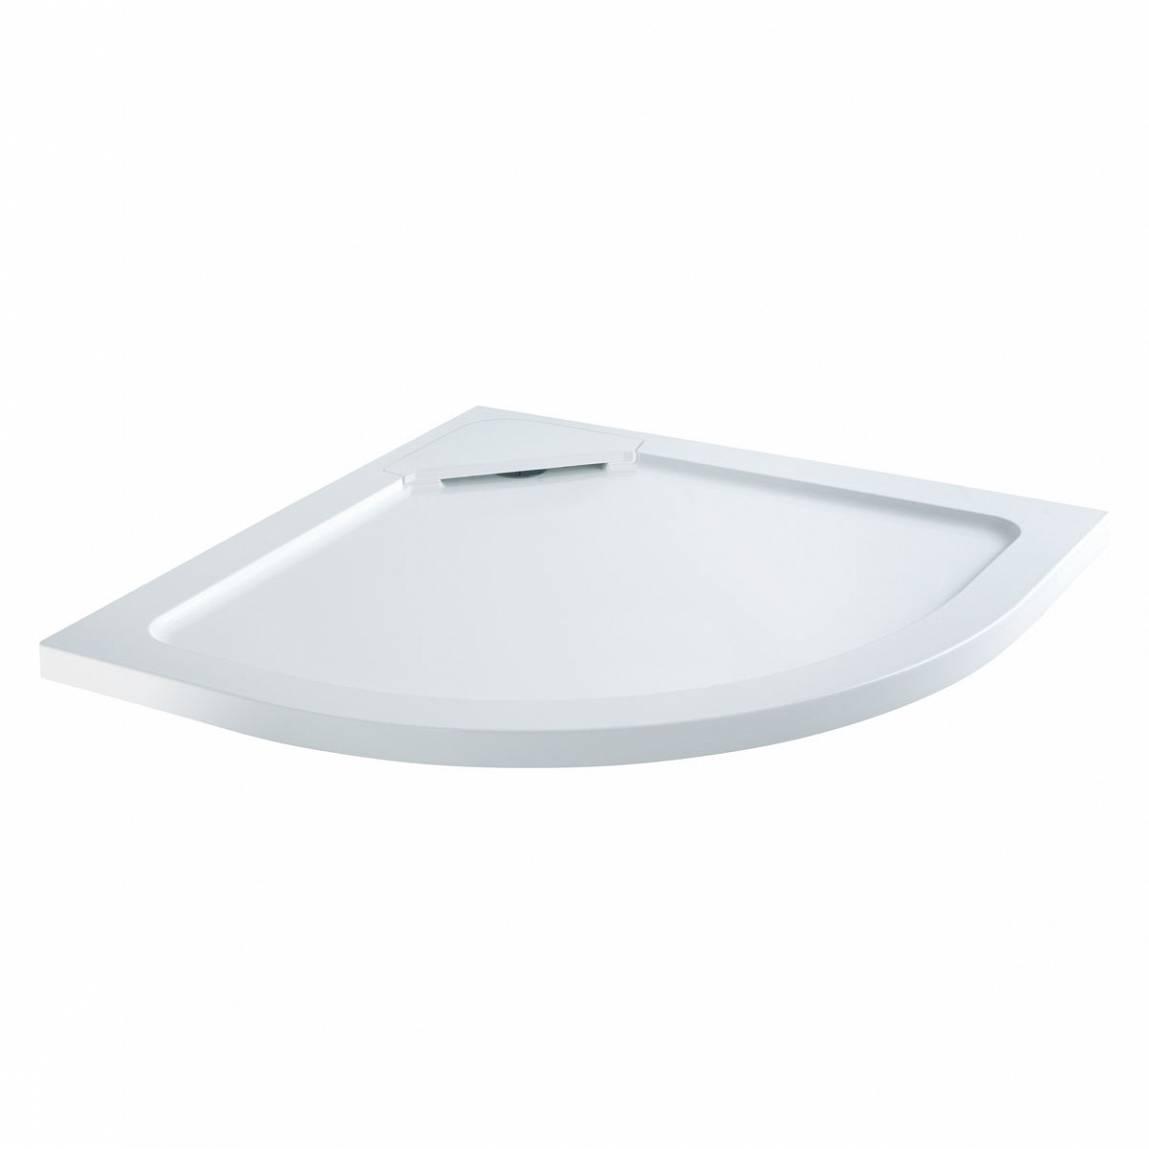 Image of Designer Quadrant Stone Shower Tray 800 x 800